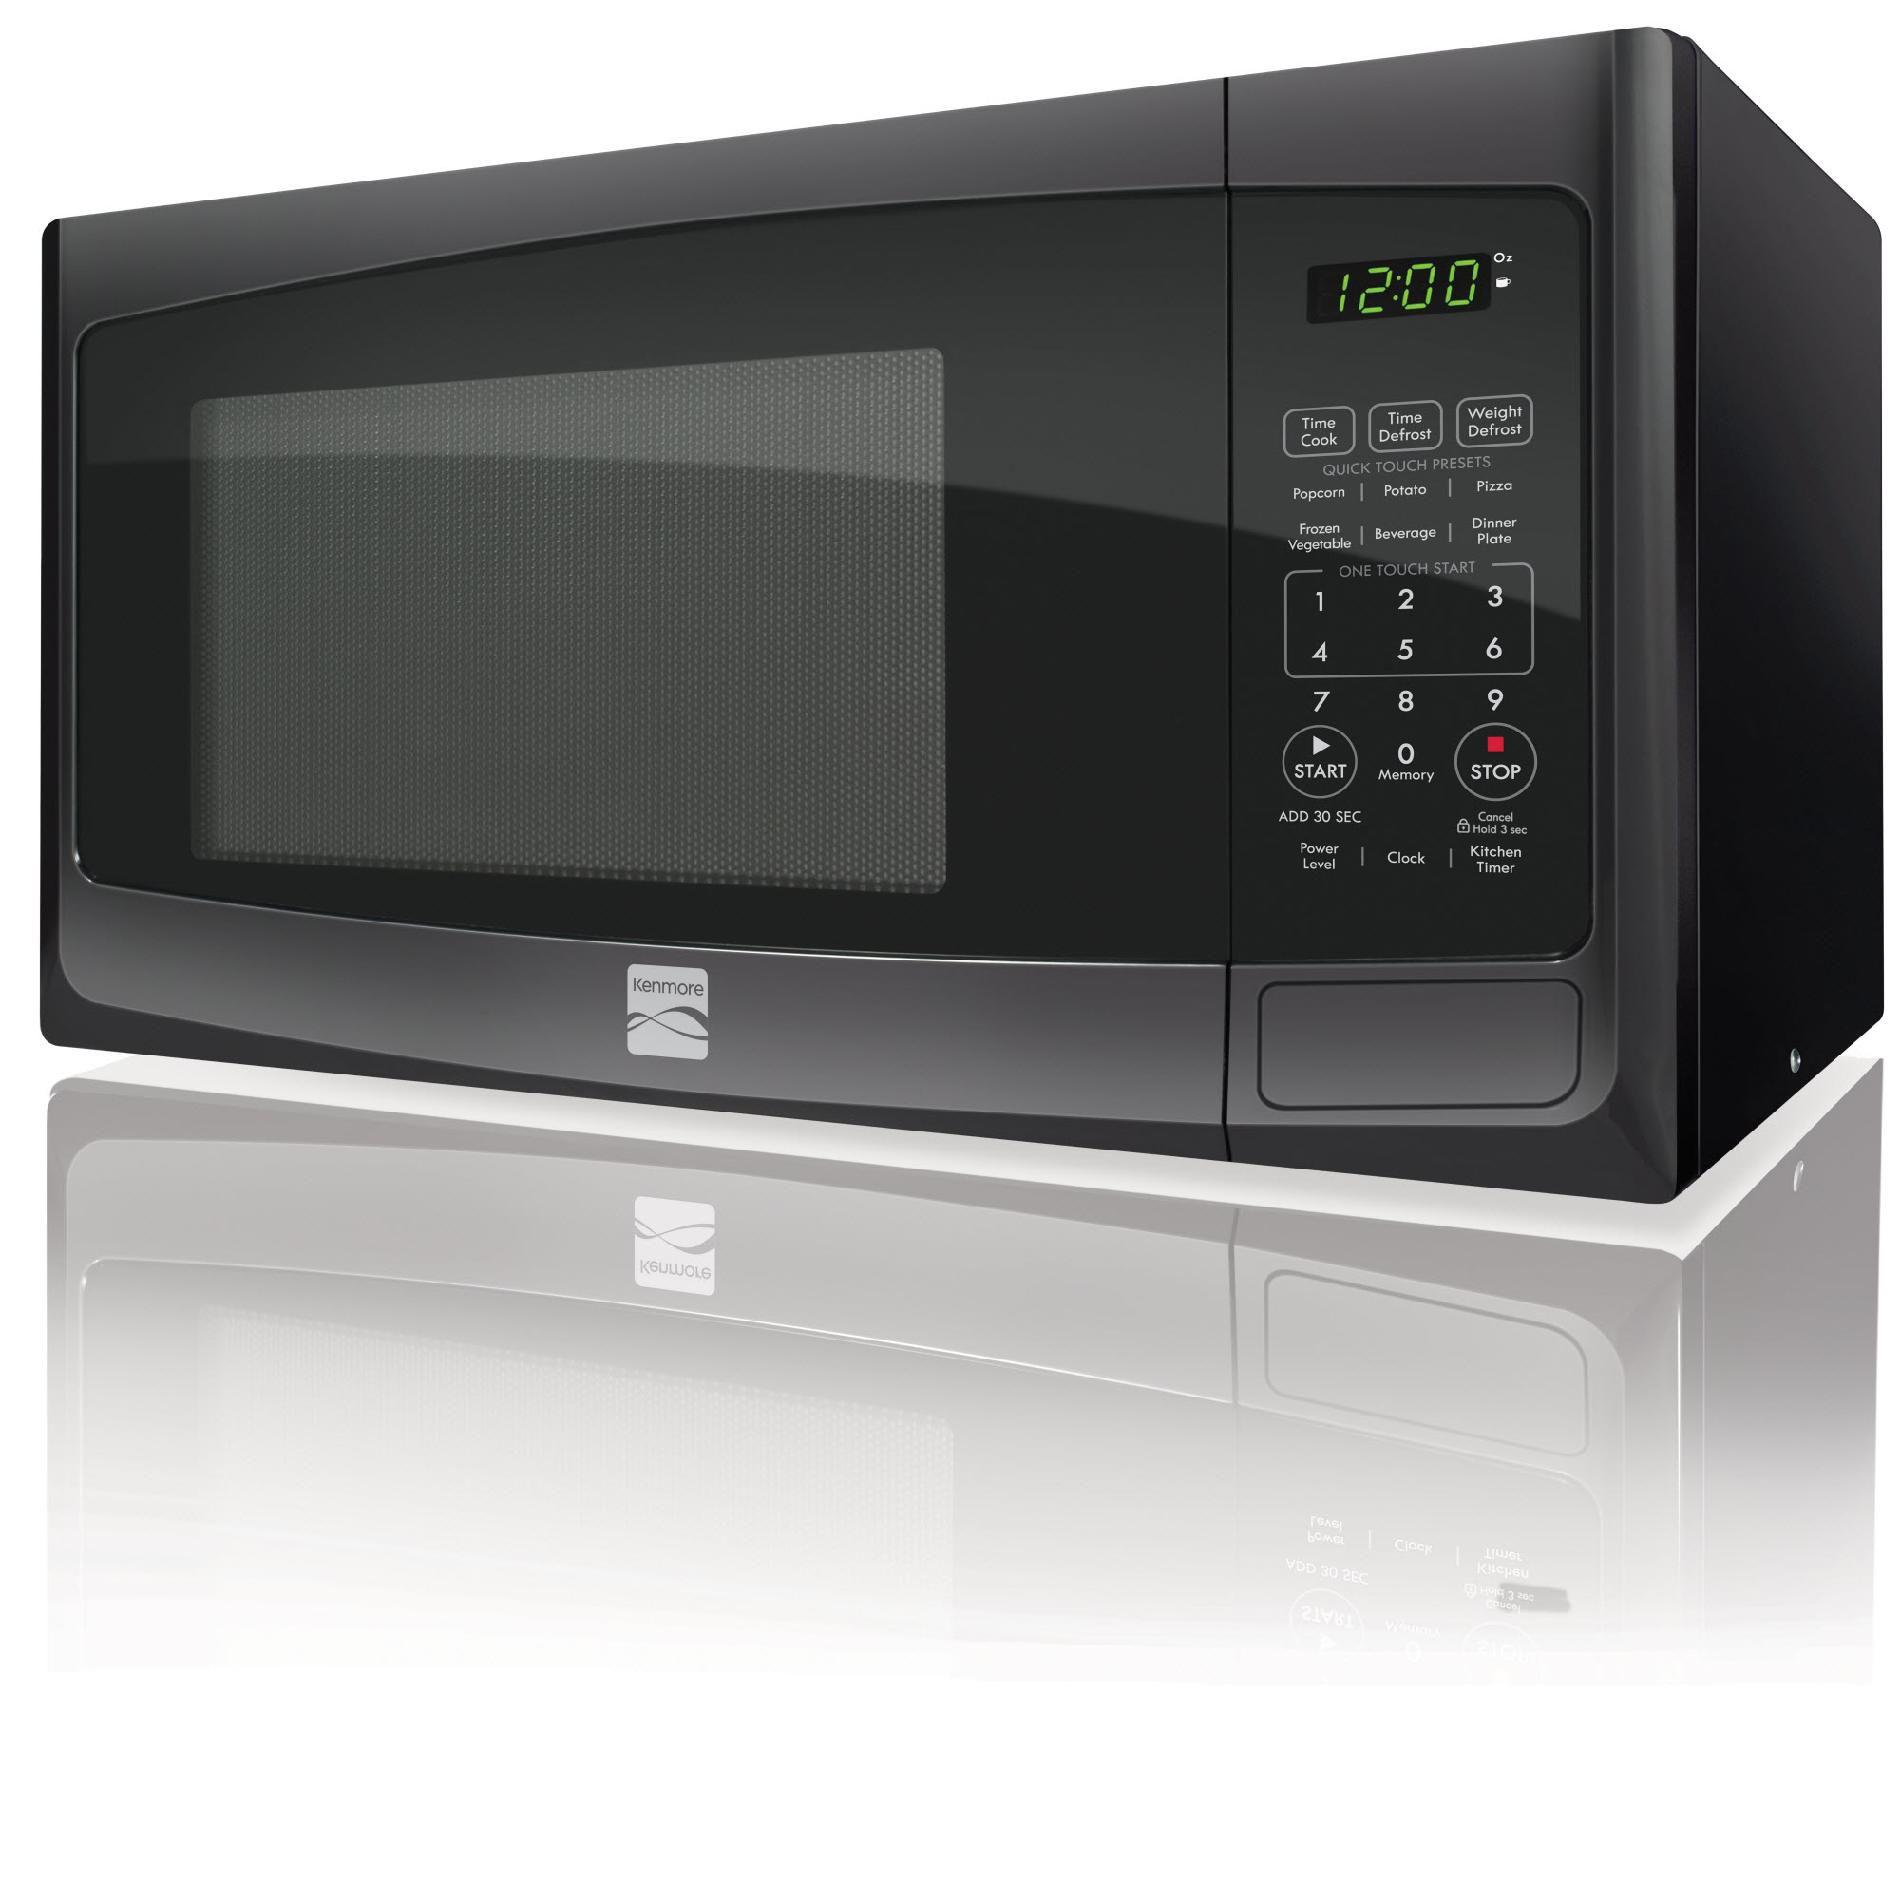 Kenmore 0.9 Cu. Ft. Countertop Microwave Black